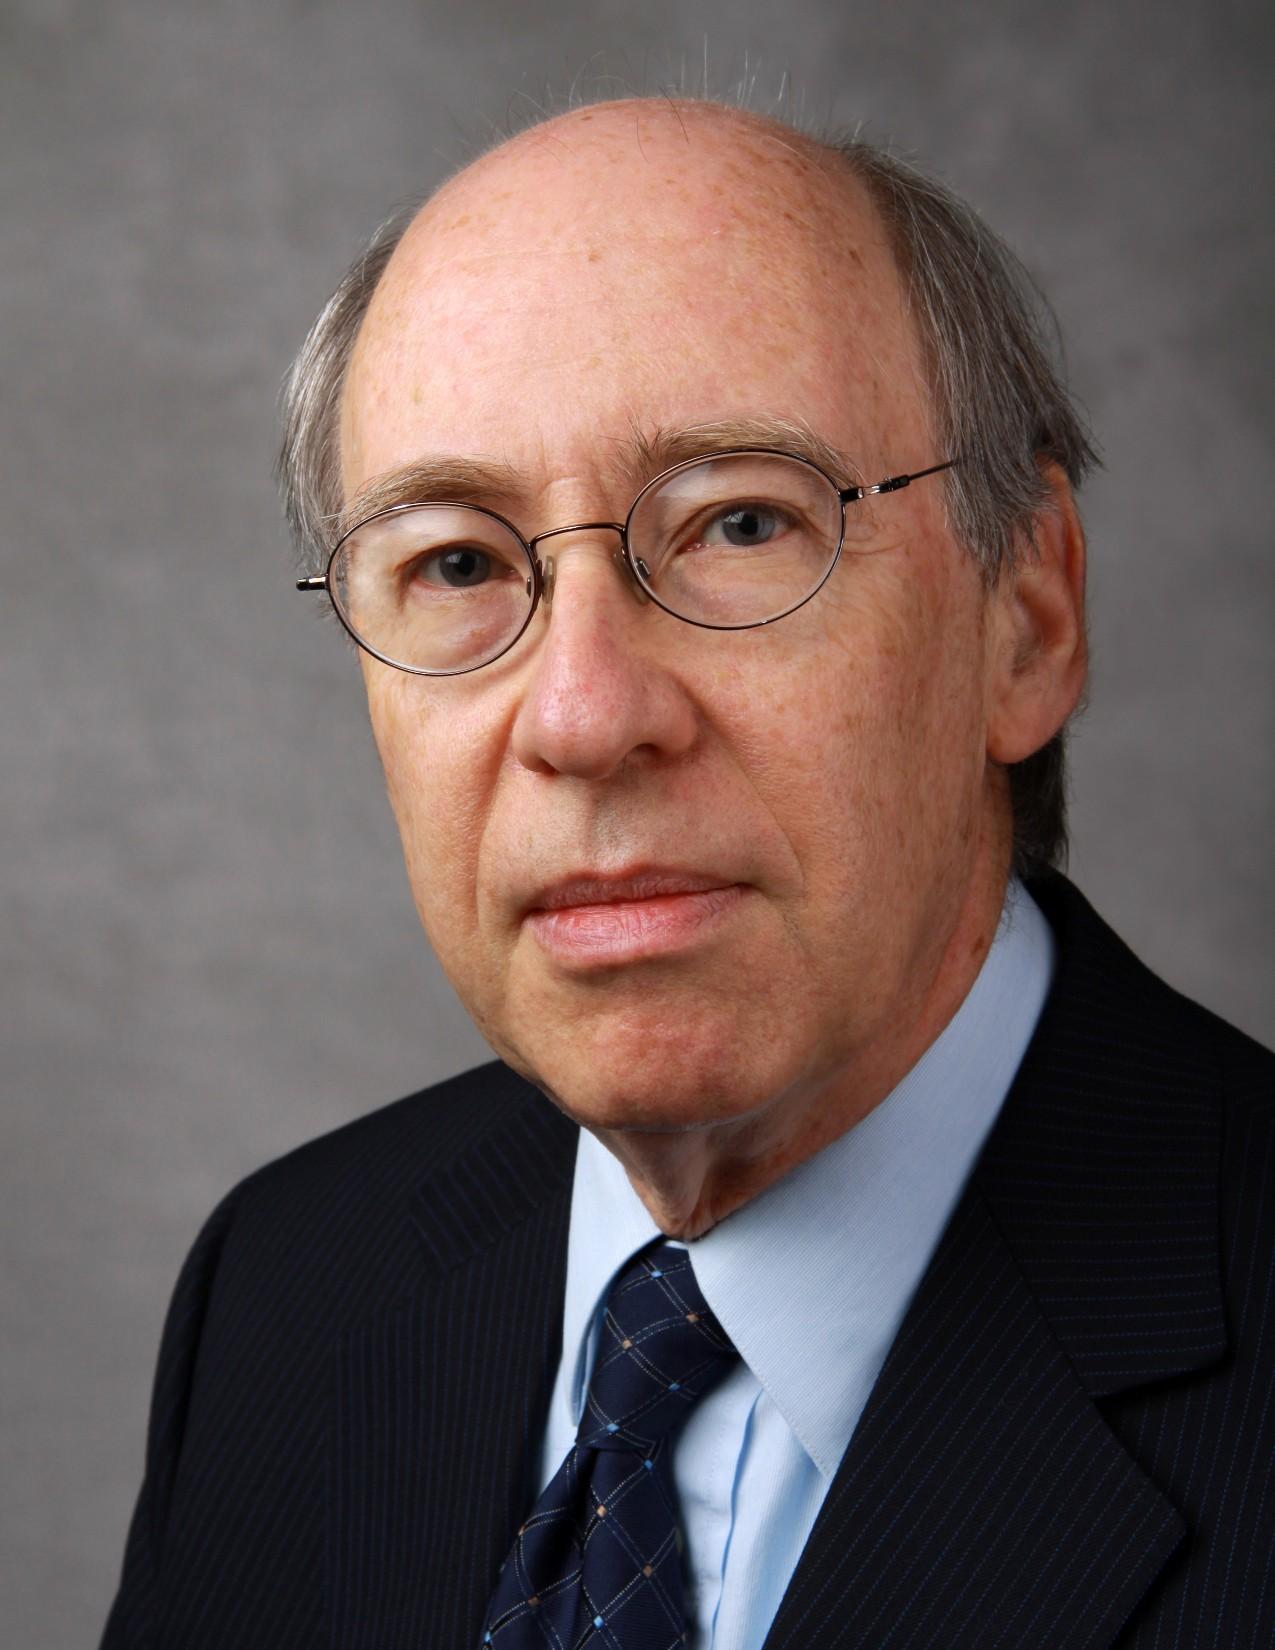 Lawrence Katzenstein